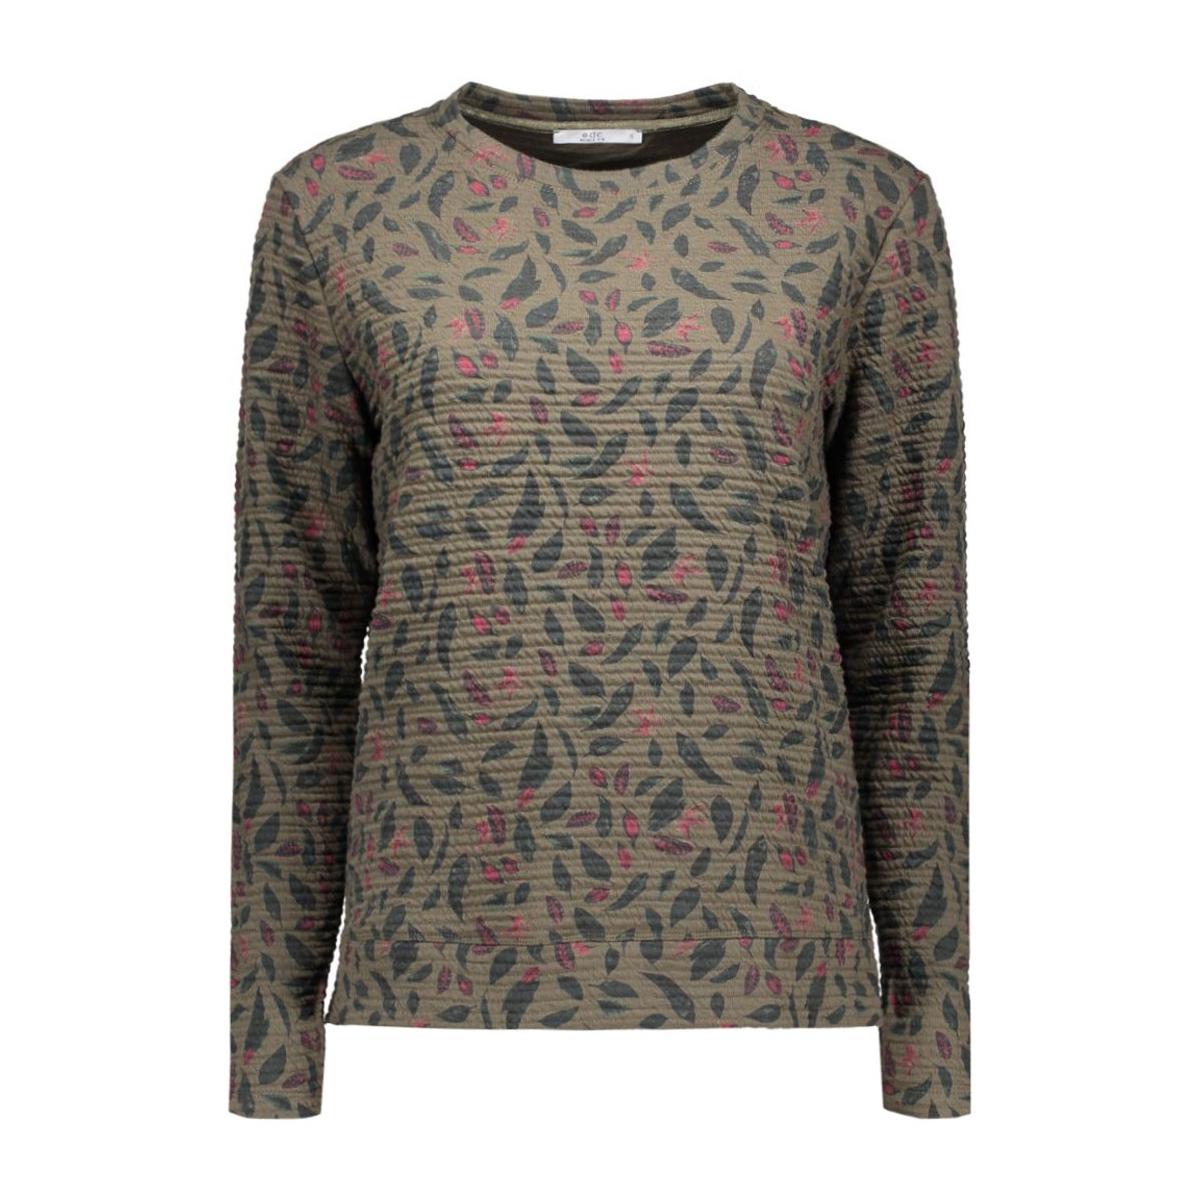 096cc1j011 edc sweater c355